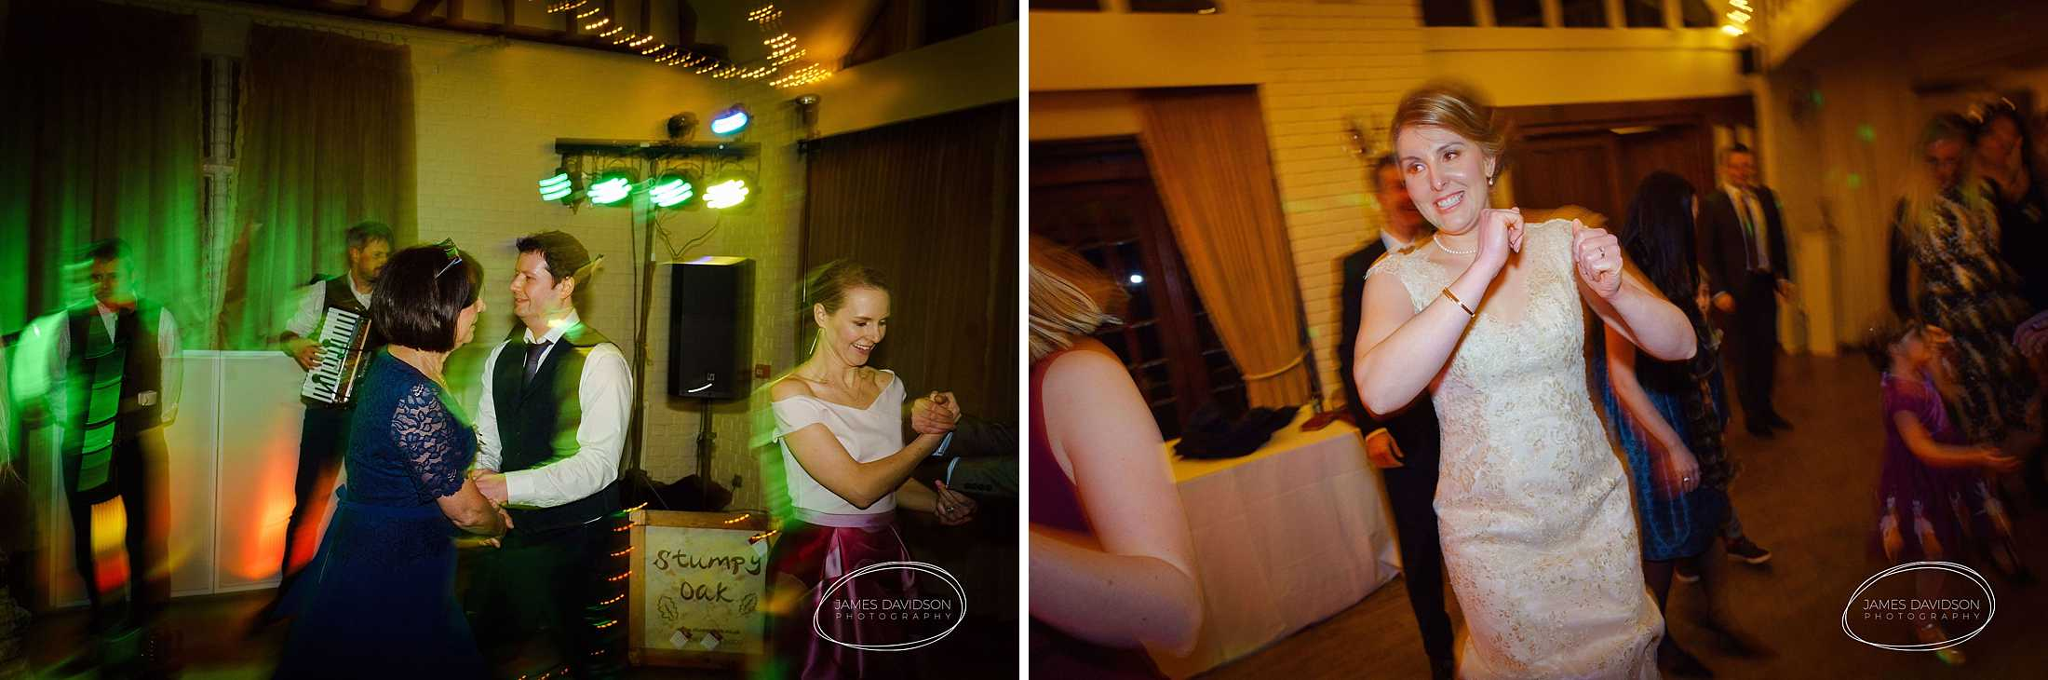 seckford-hall-wedding-092